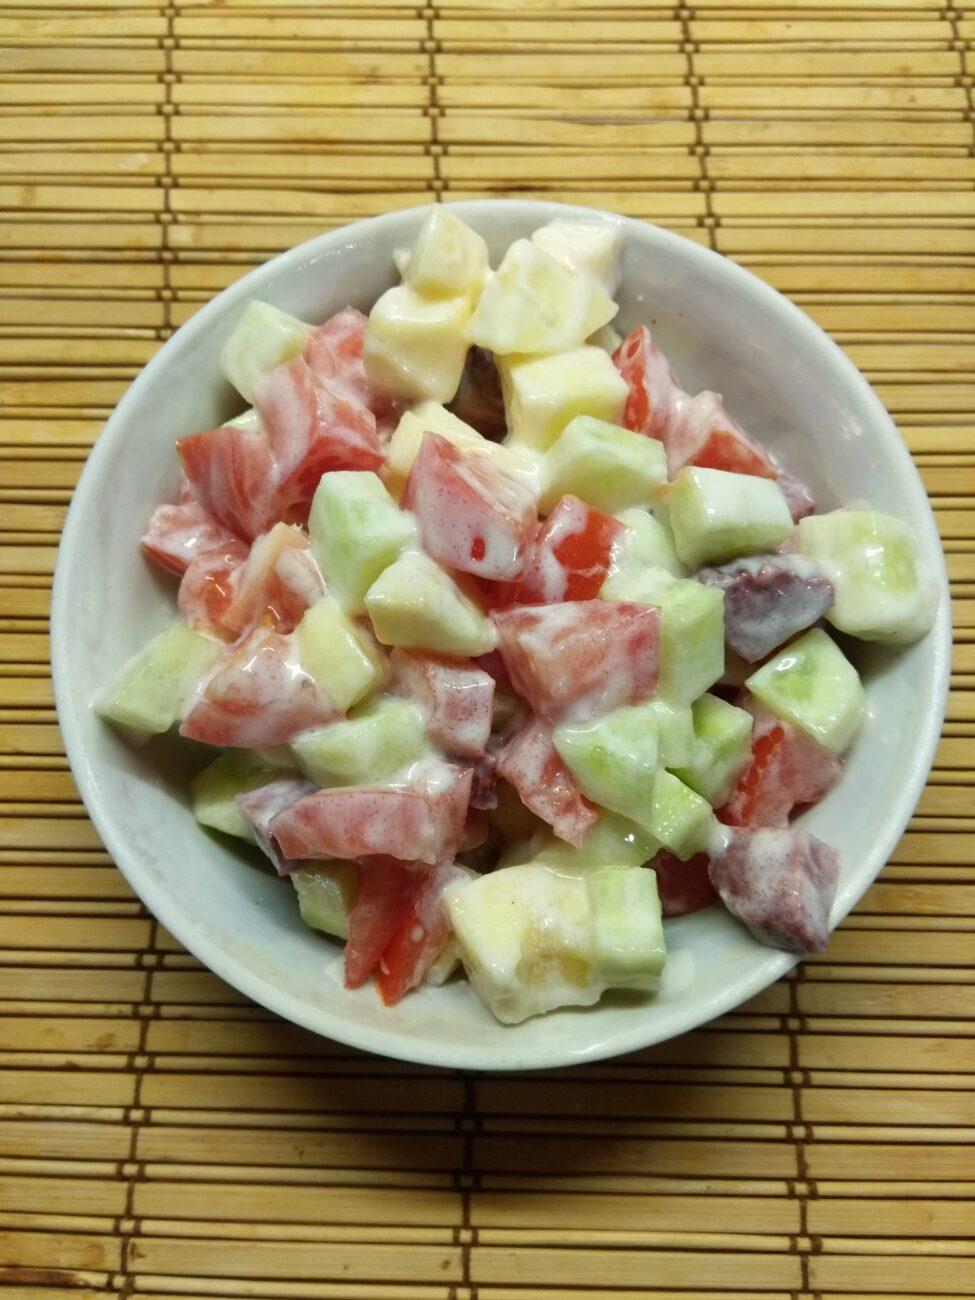 Салат из салями, помидоров, огурцов и яблок